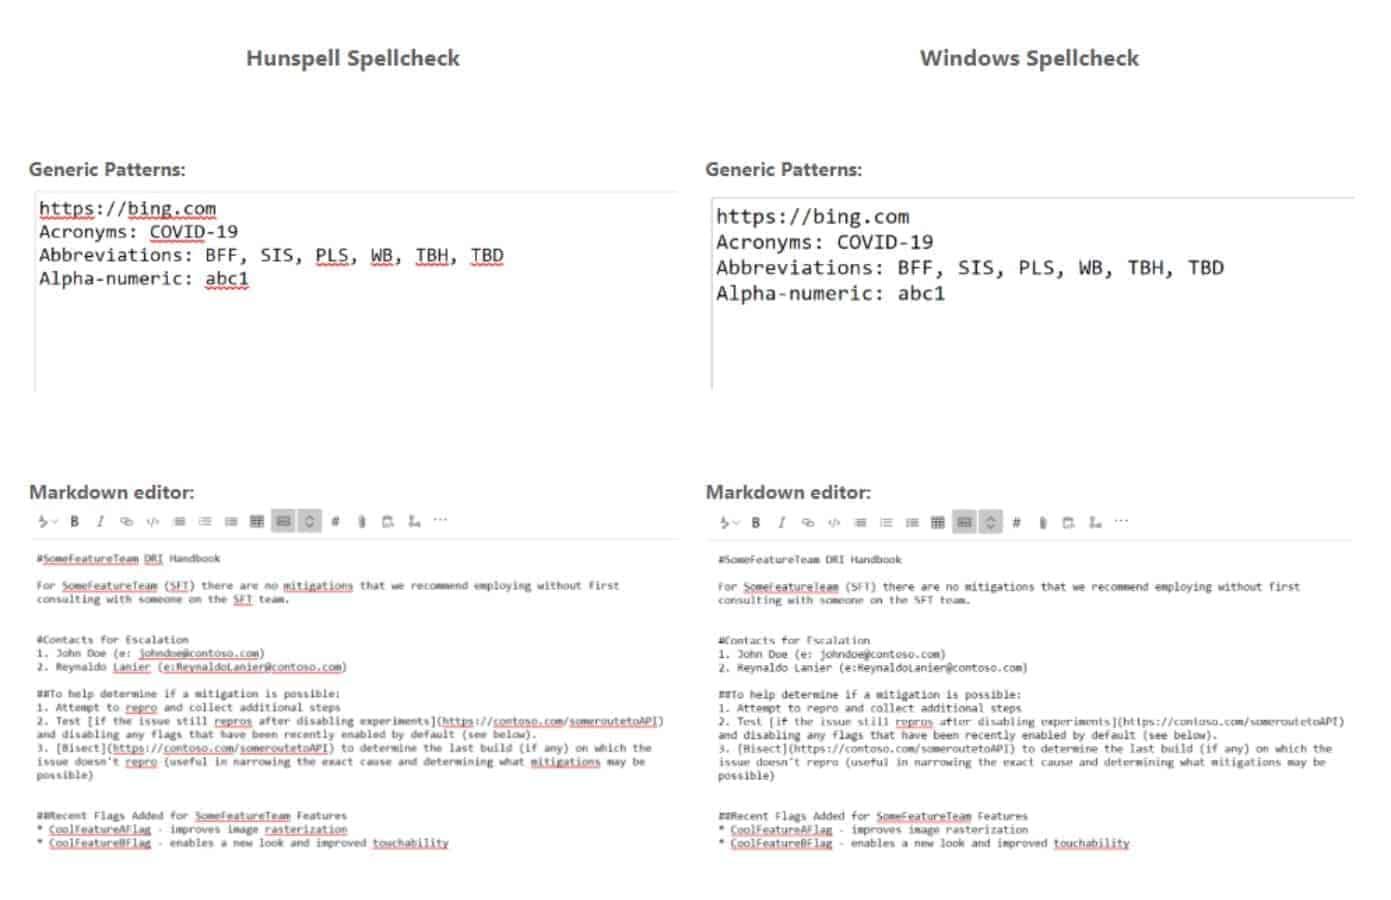 google chrome microsoft edge windows spellcheck 1